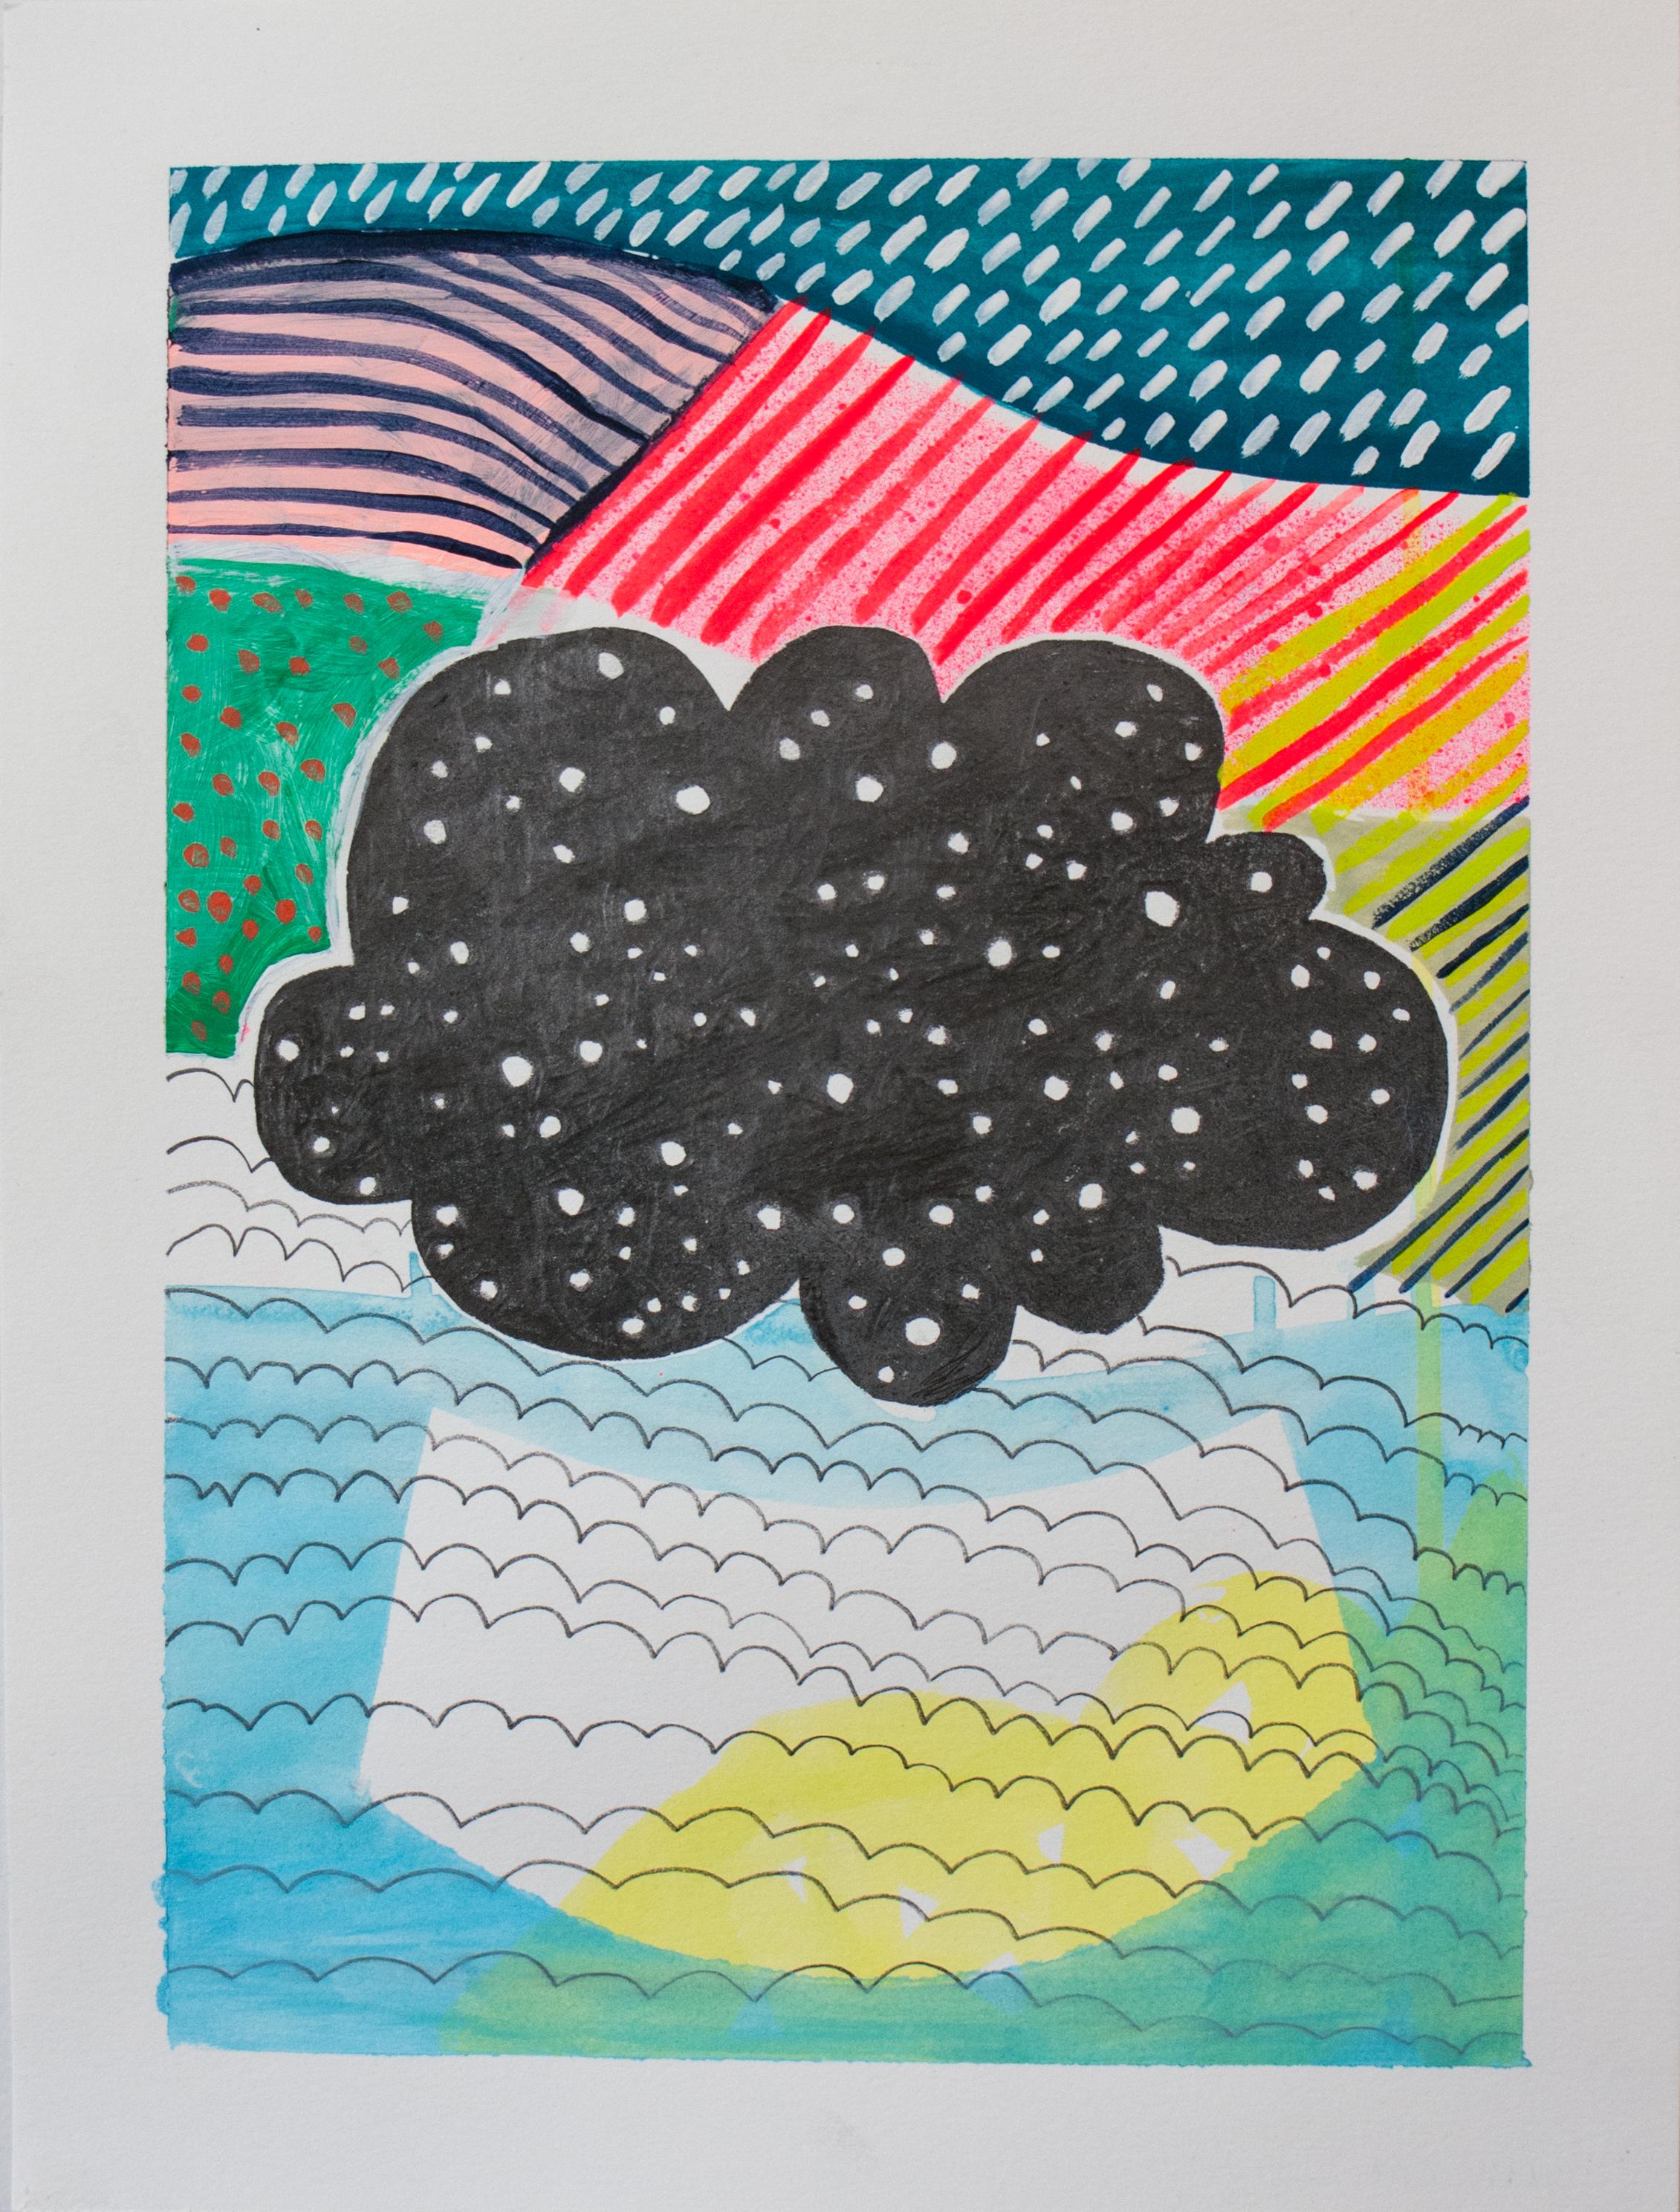 "Cloud Car, 11"" x 9,"" graphite, acrylic, gouache on paper (SOLD)"